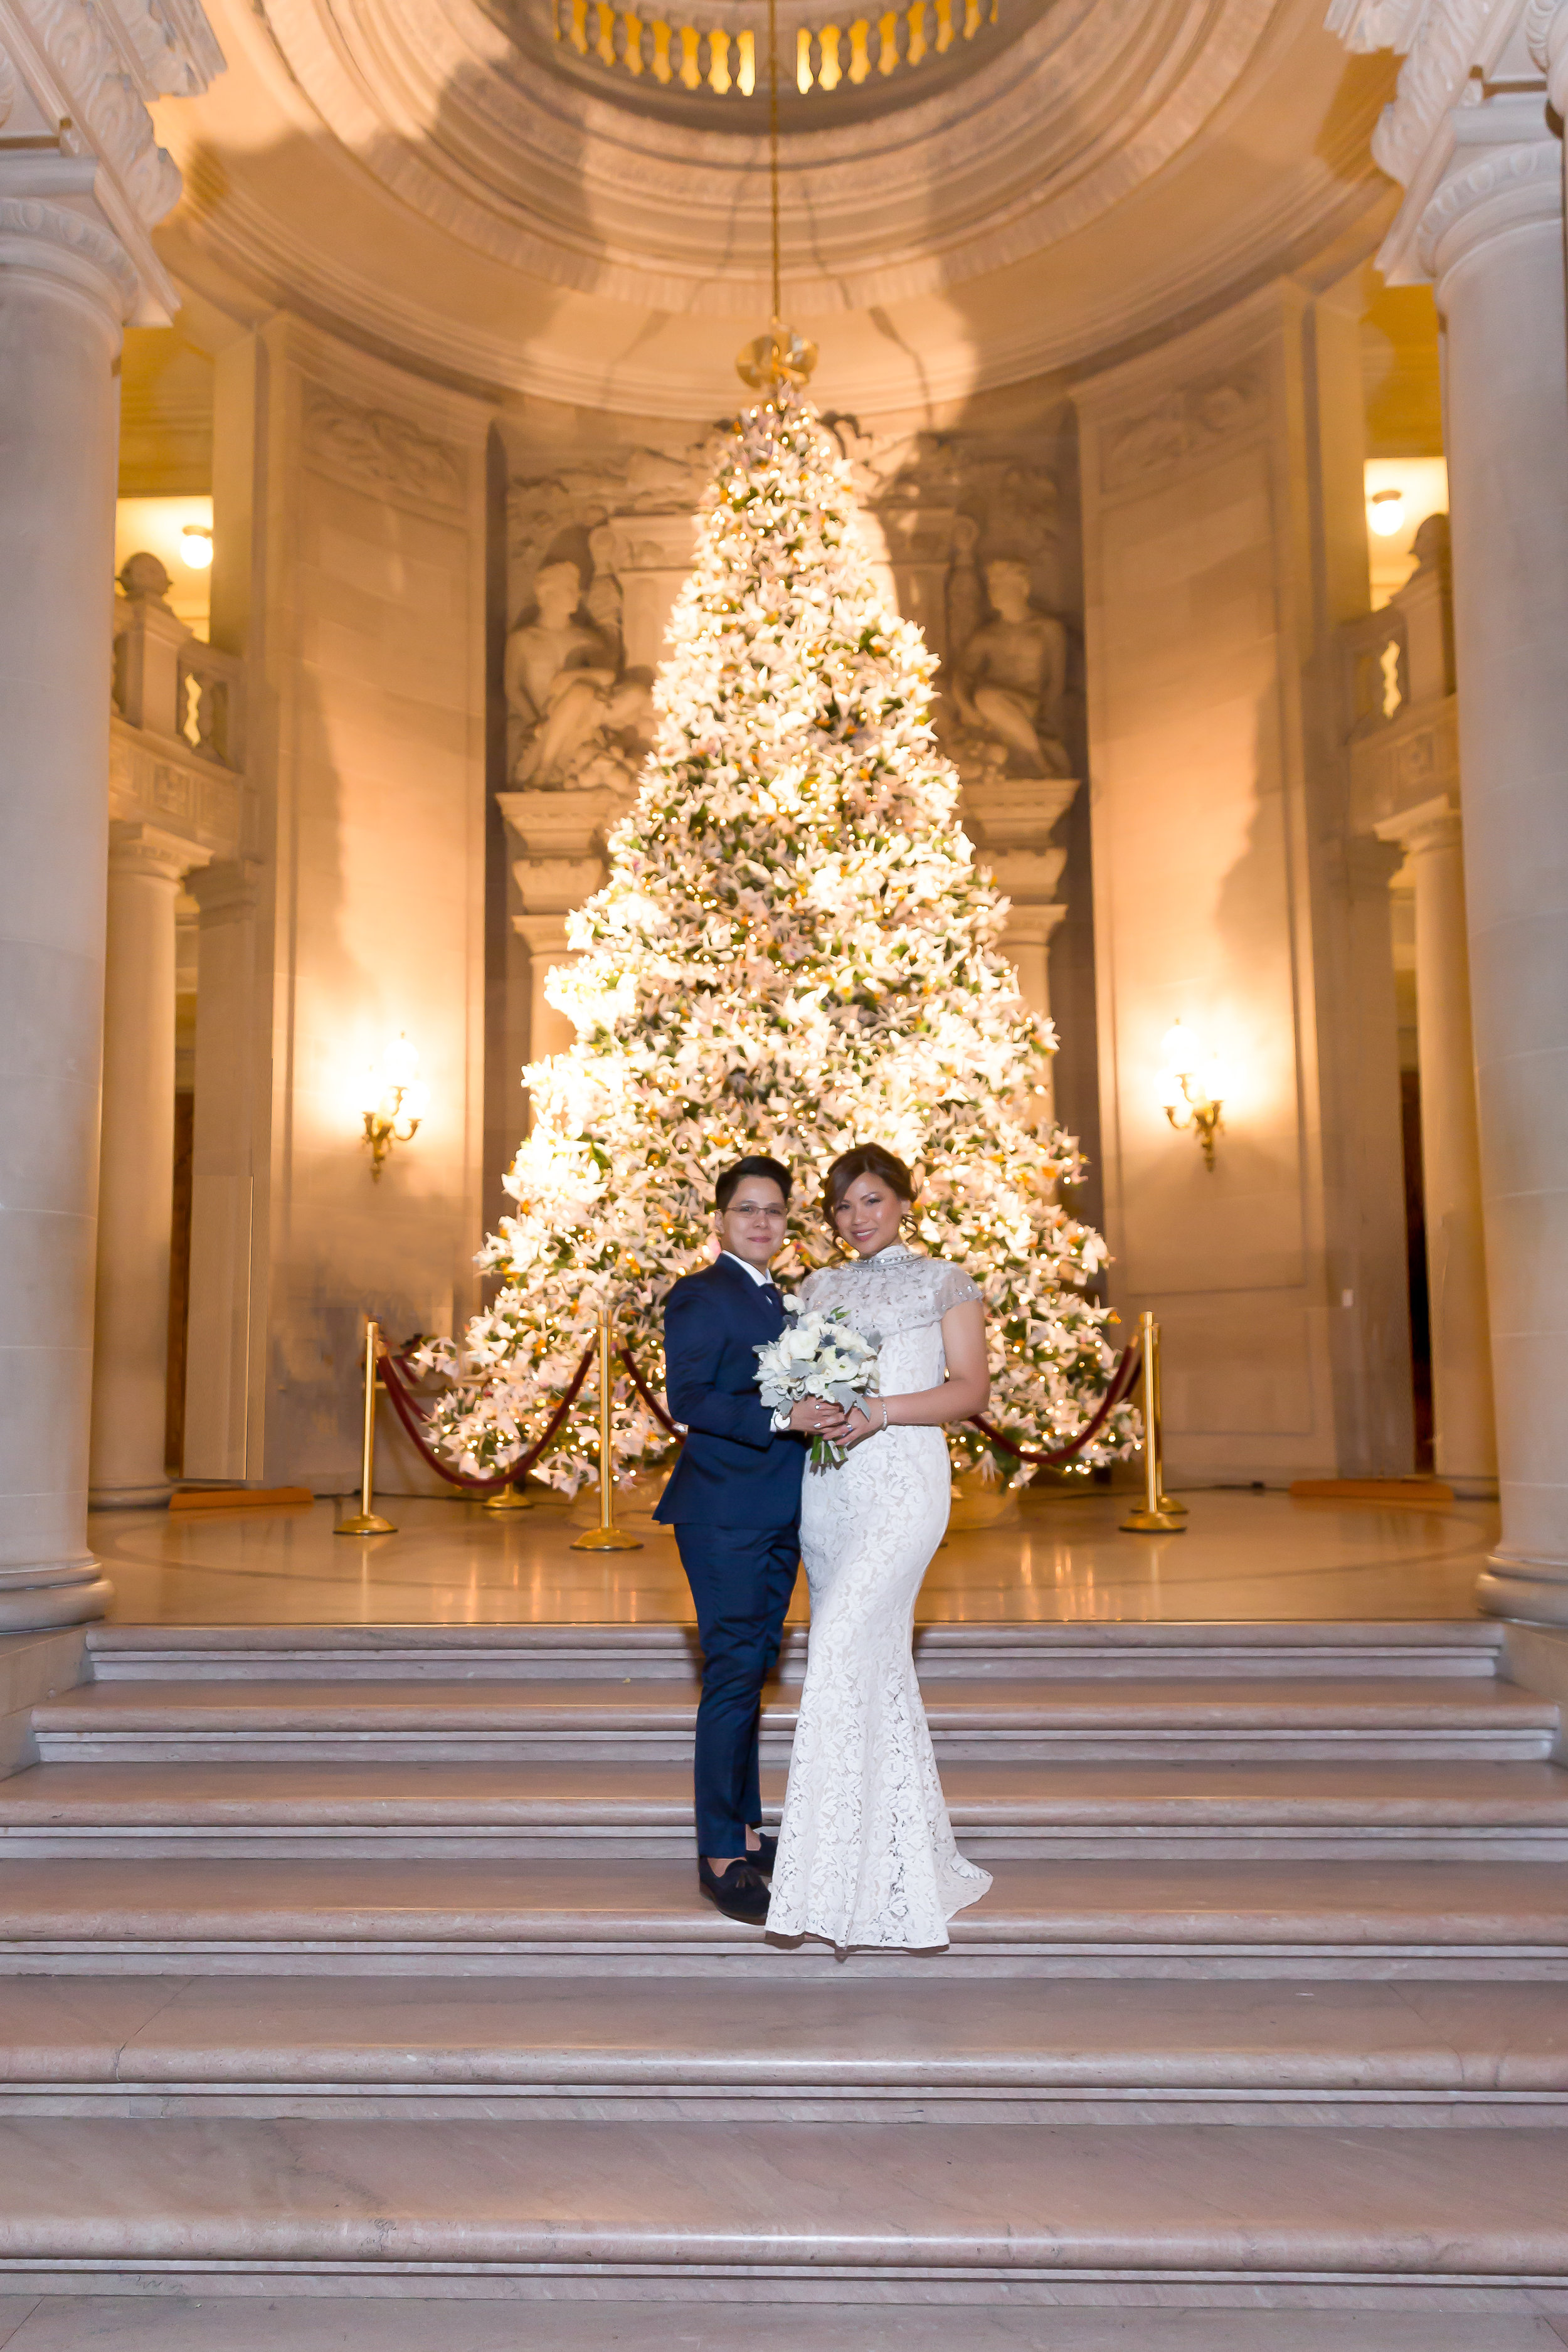 Toshi Tazawa Photography - San Francisco Destination Wedding Photographer-37e.jpg